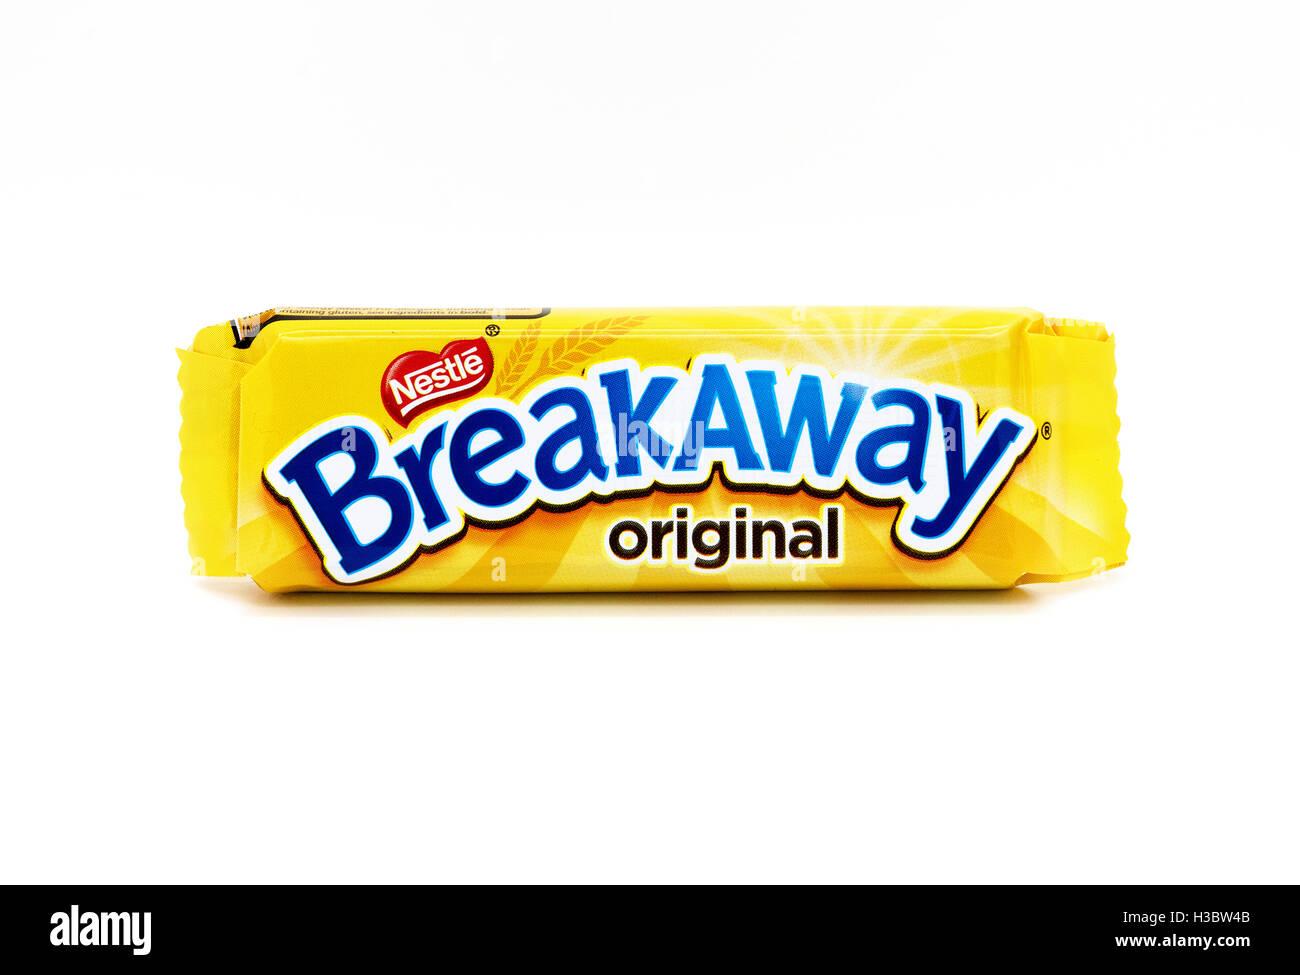 A Nestle Breakaway chocolate biscuit bar - Stock Image